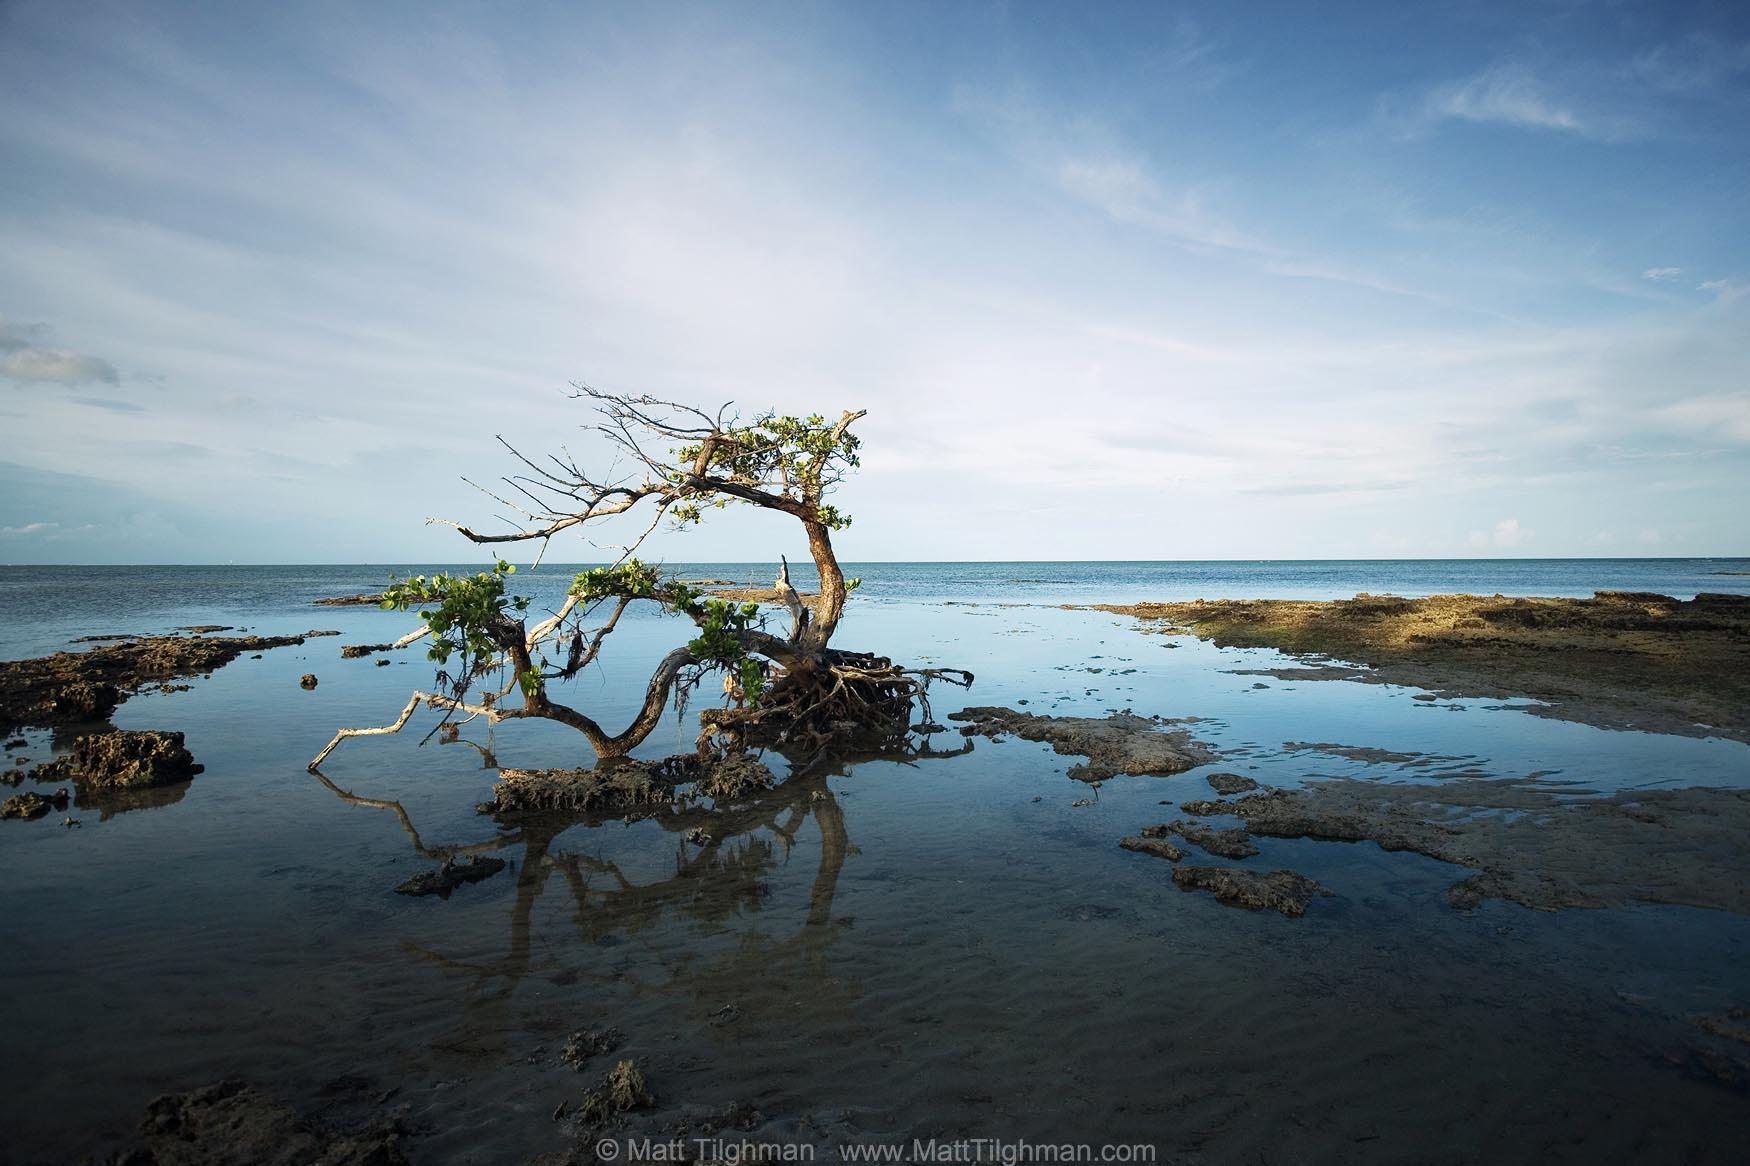 Last Man Standing - Gnarled Old Mangrove